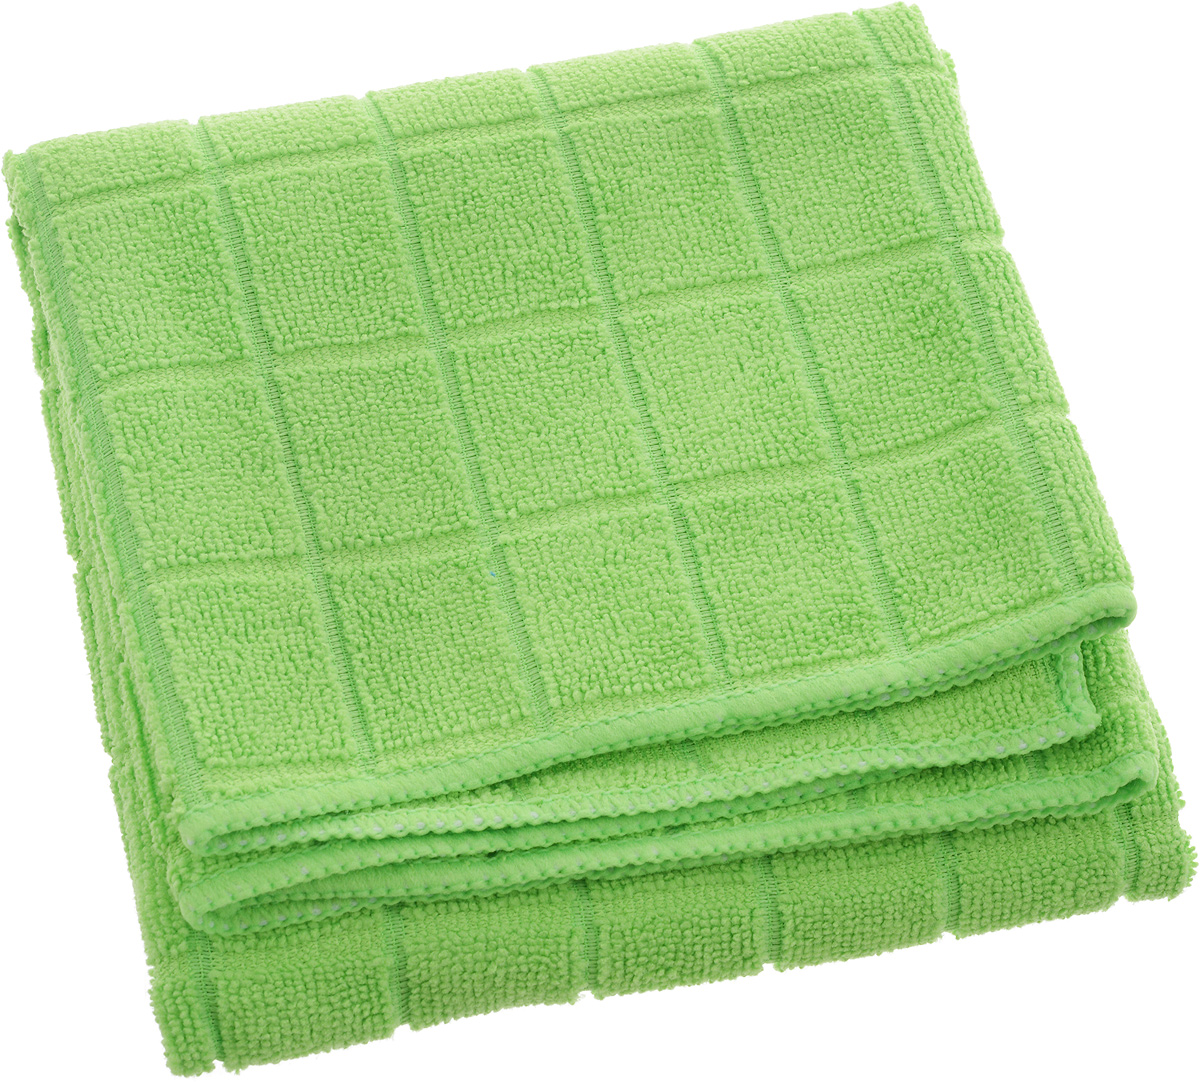 Салфетка Airline, цвет: зеленый, 50 х 70 см салфетка clean cloth уборки кухни пыли посуды желтый зеленый розовый